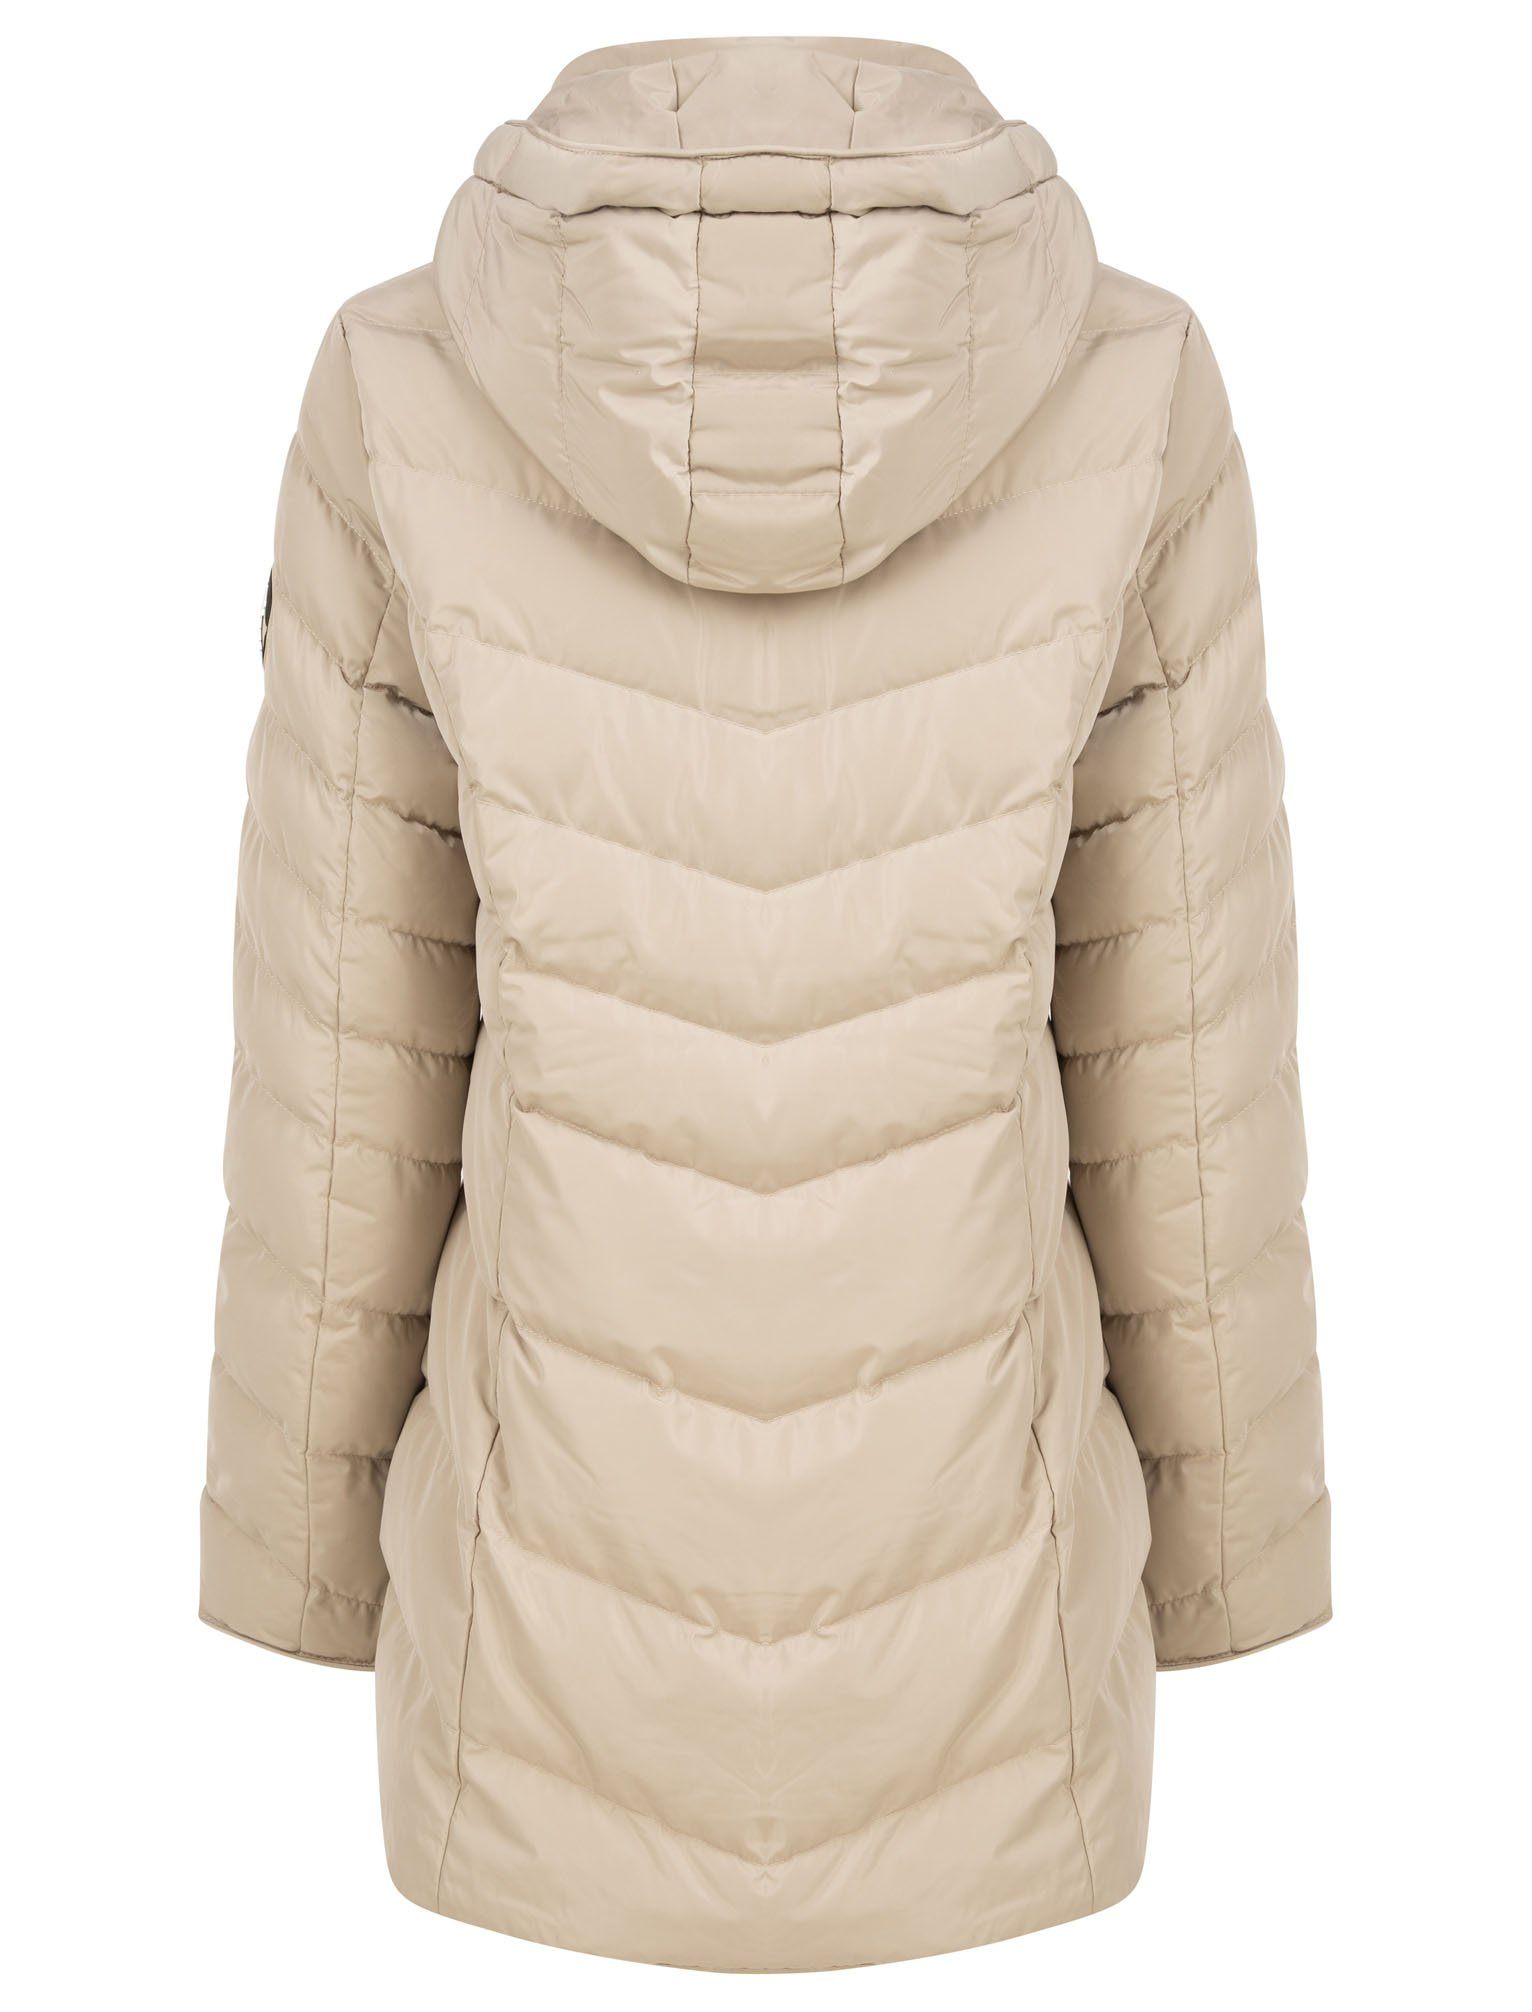 Women/'s Tokyo Laundry Jaboris Longline Quilted Puffer Jacket in Cream